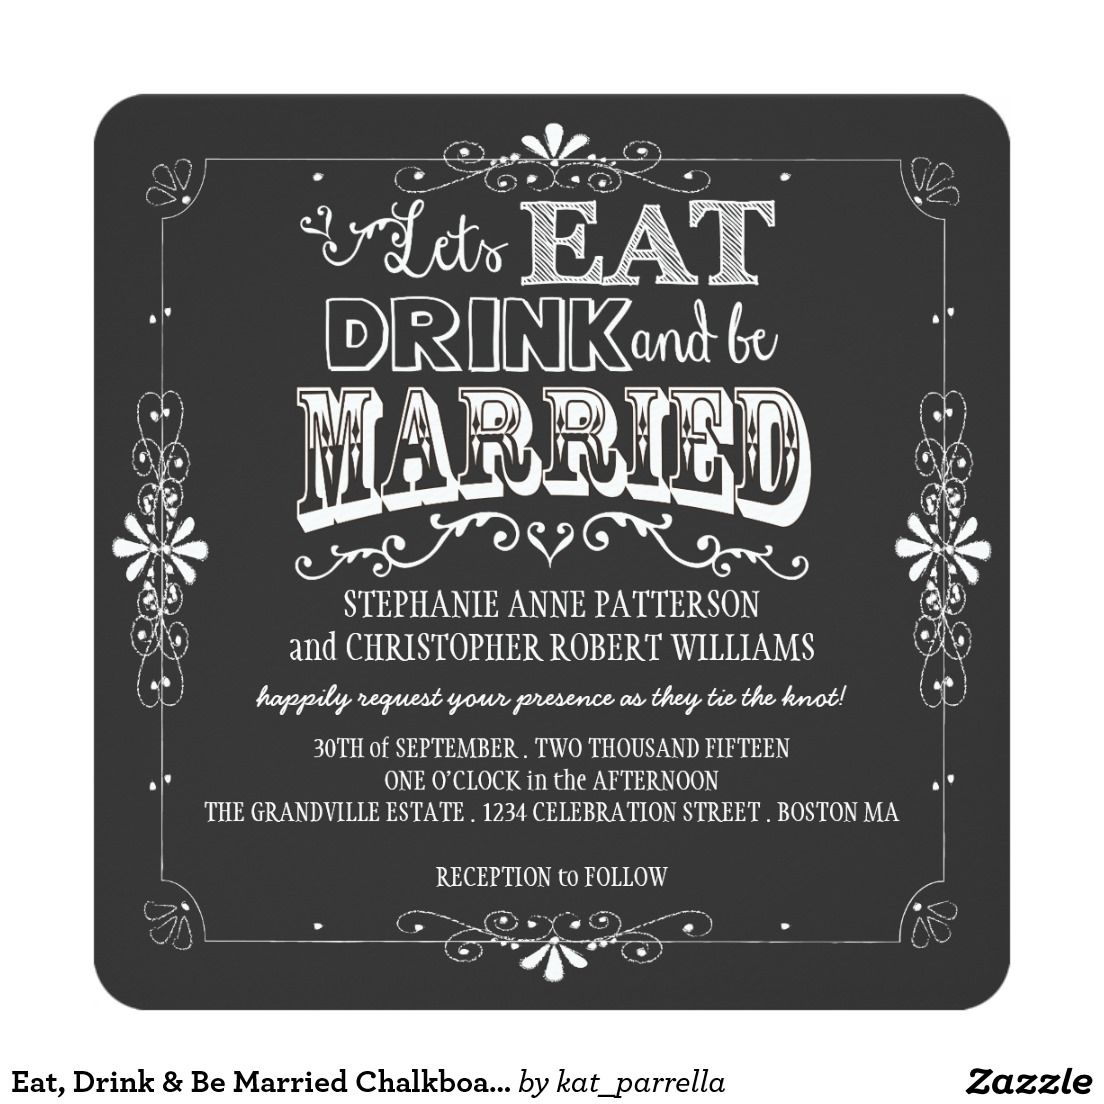 eat, drink & be married chalkboard style wedding card, Wedding invitations